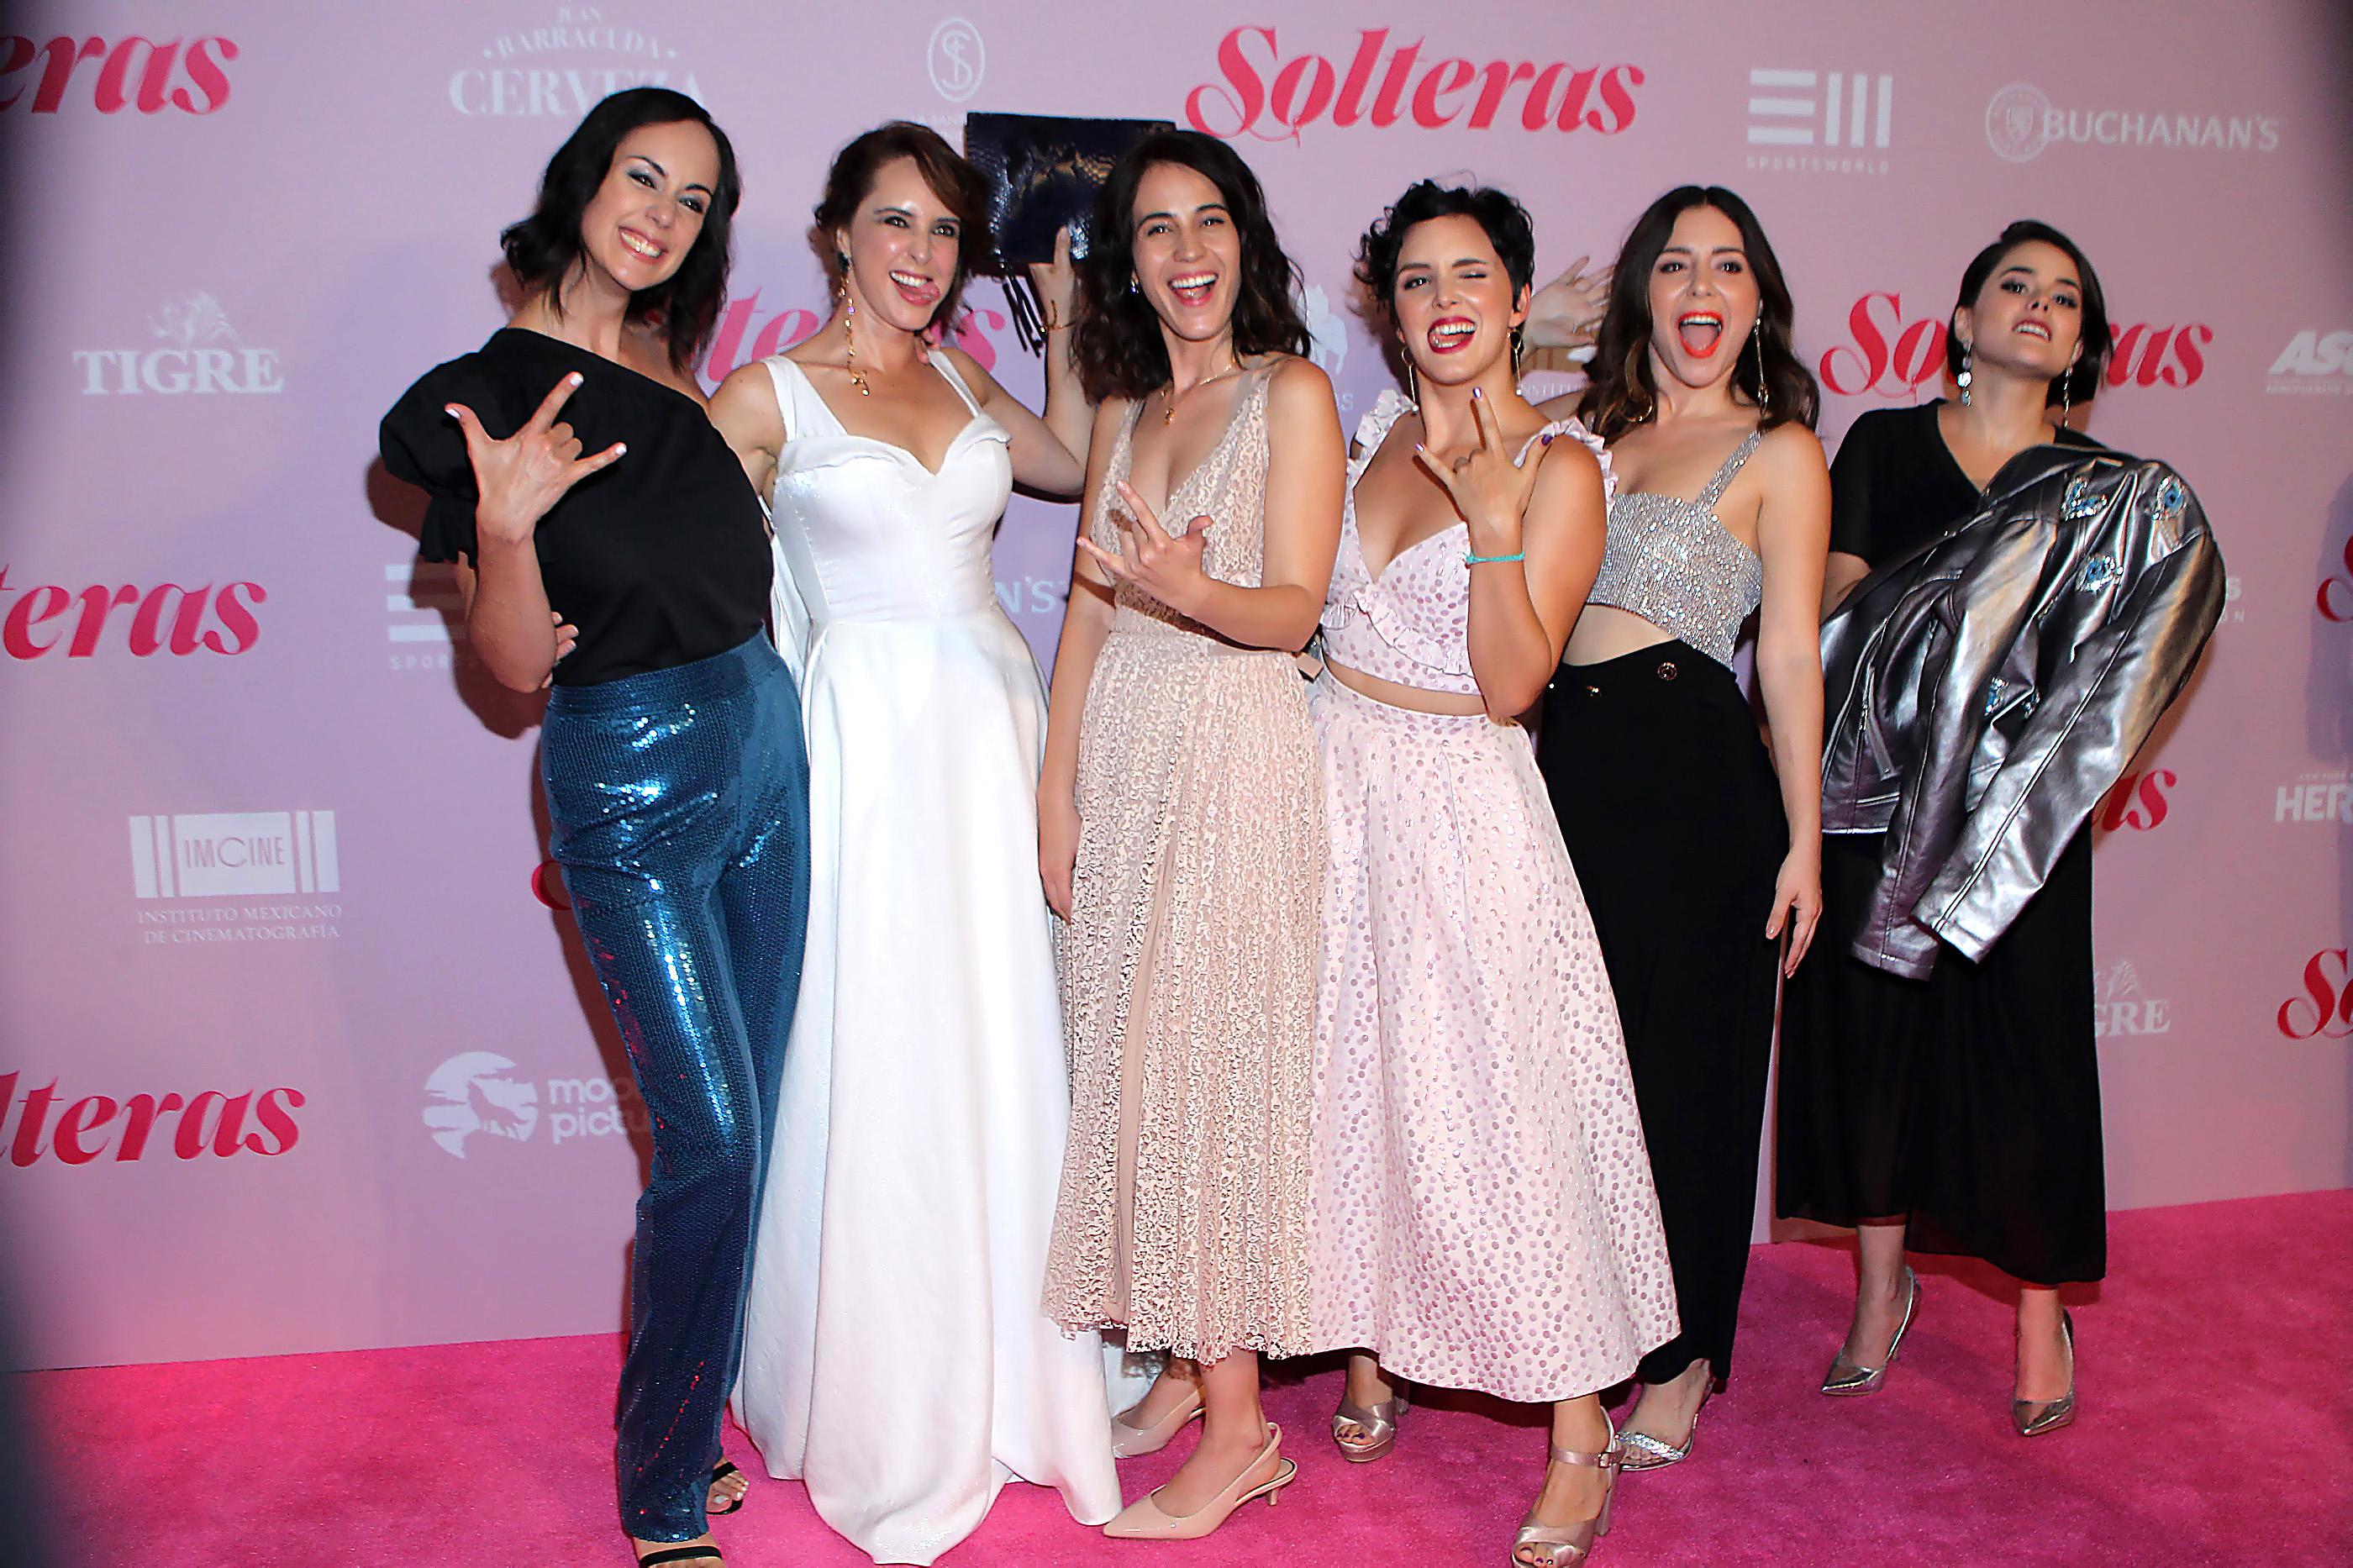 Gaby de la Garza, Irán Castillo, Cassandra Ciangherotti, Mariana Cabrera, Diana Bovio, Tatiana Del Real